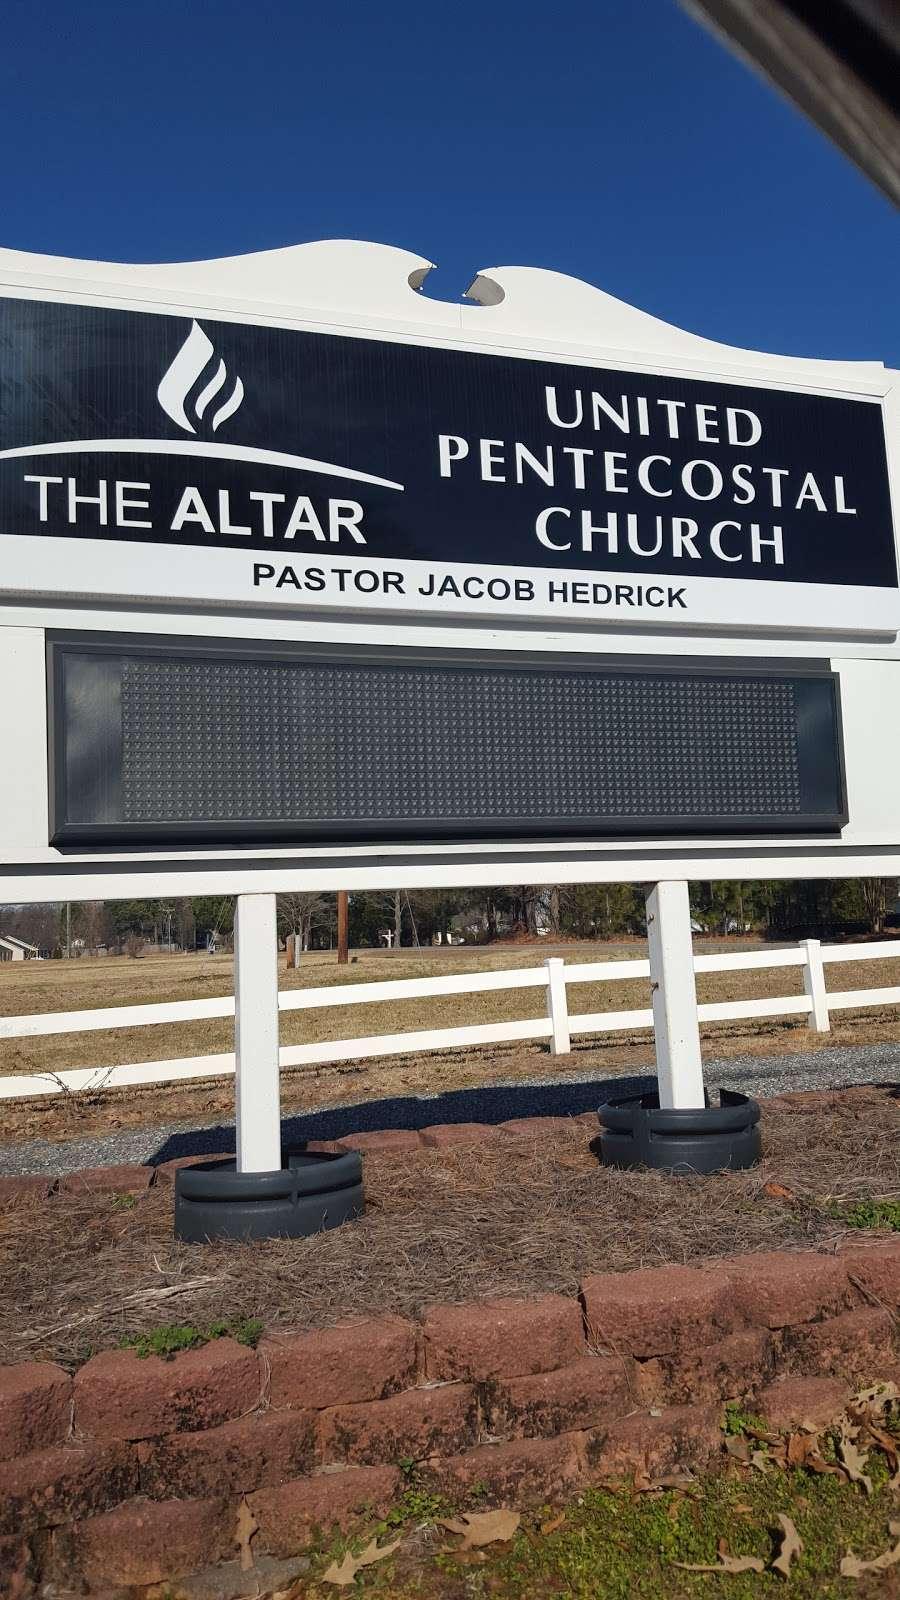 New Hope Baptist Church - church  | Photo 2 of 2 | Address: 188 Wiggins Rd, Mooresville, NC 28115, USA | Phone: (704) 663-1825